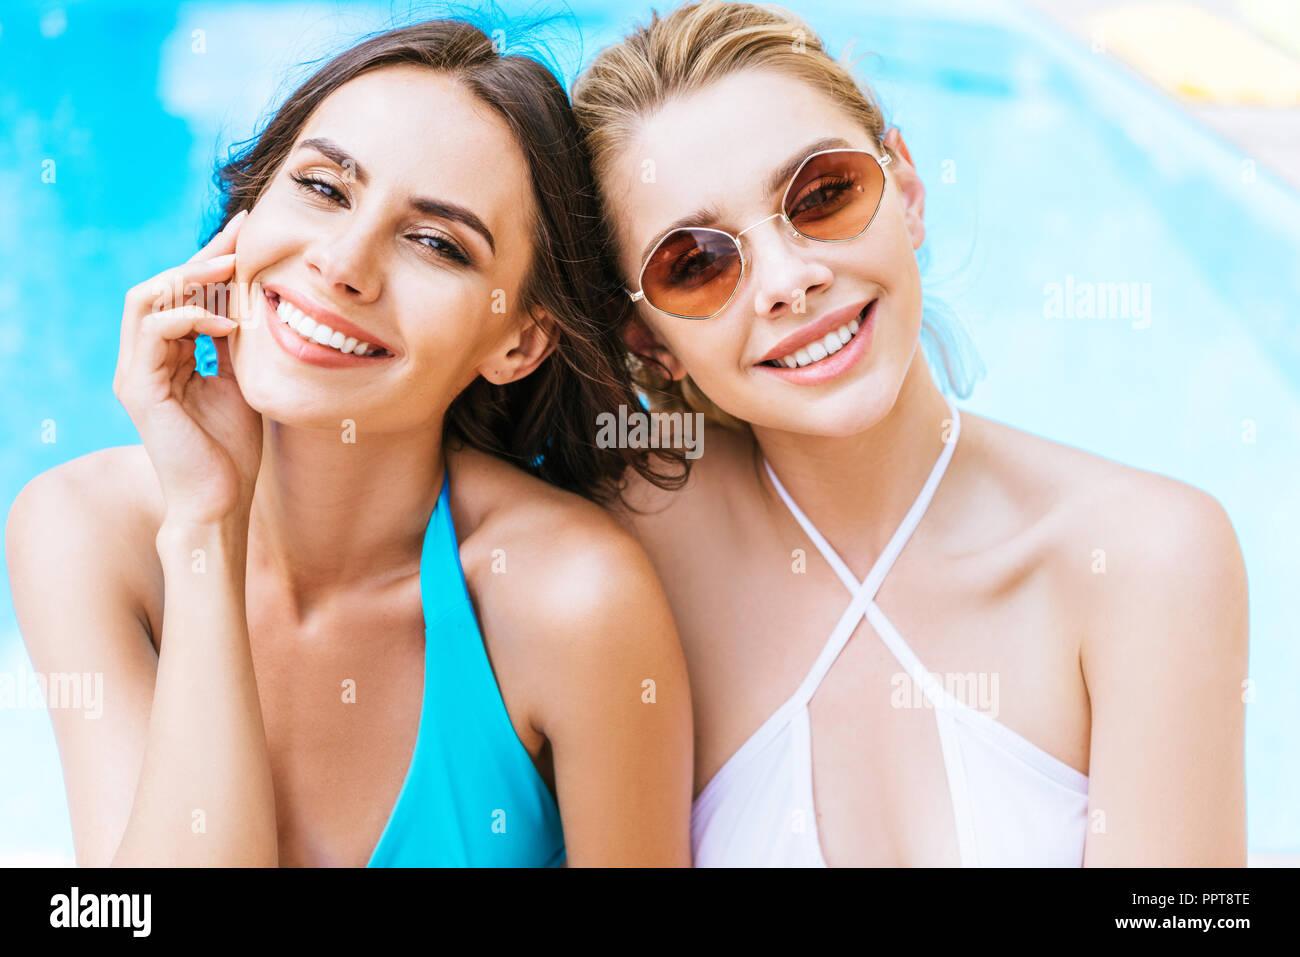 beautiful happy young women in swimwear smiling at camera near swimming pool - Stock Image